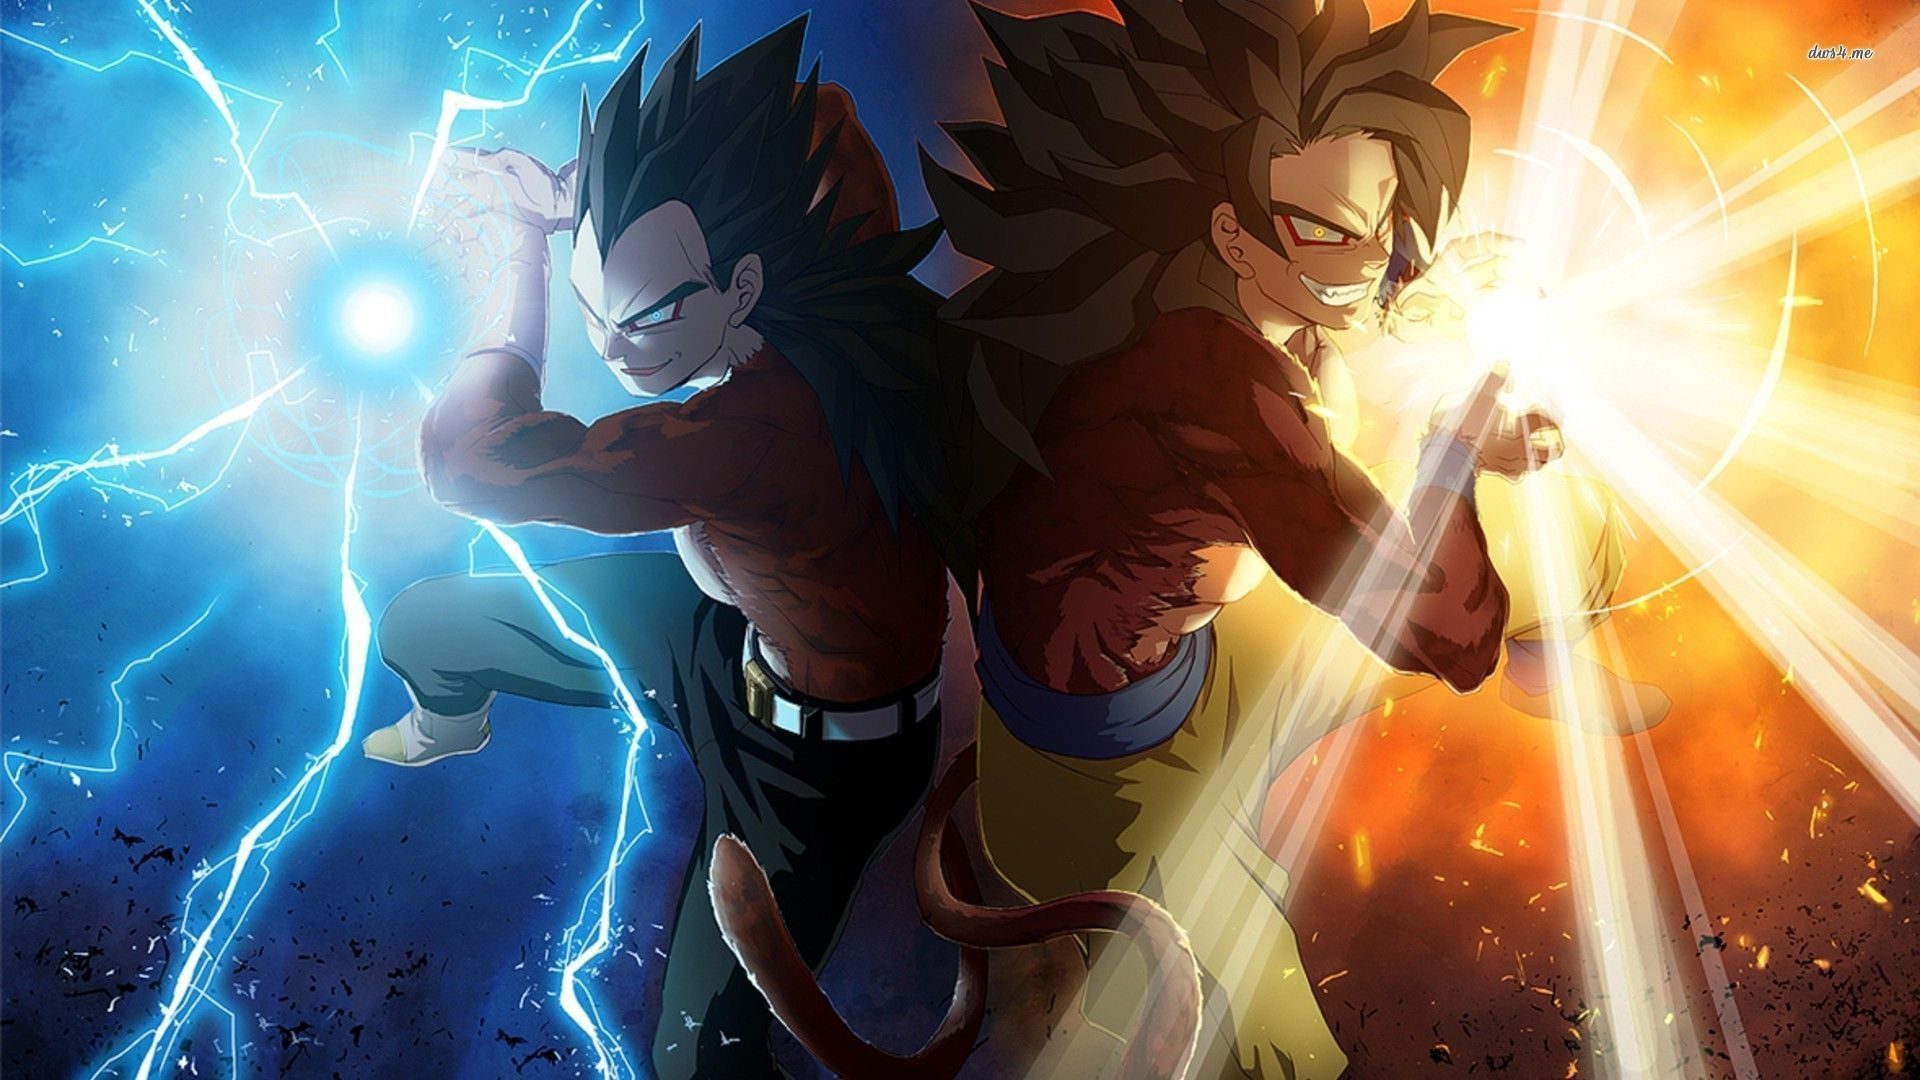 Goku Vegeta Wallpapers Top Free Goku Vegeta Backgrounds Wallpaperaccess